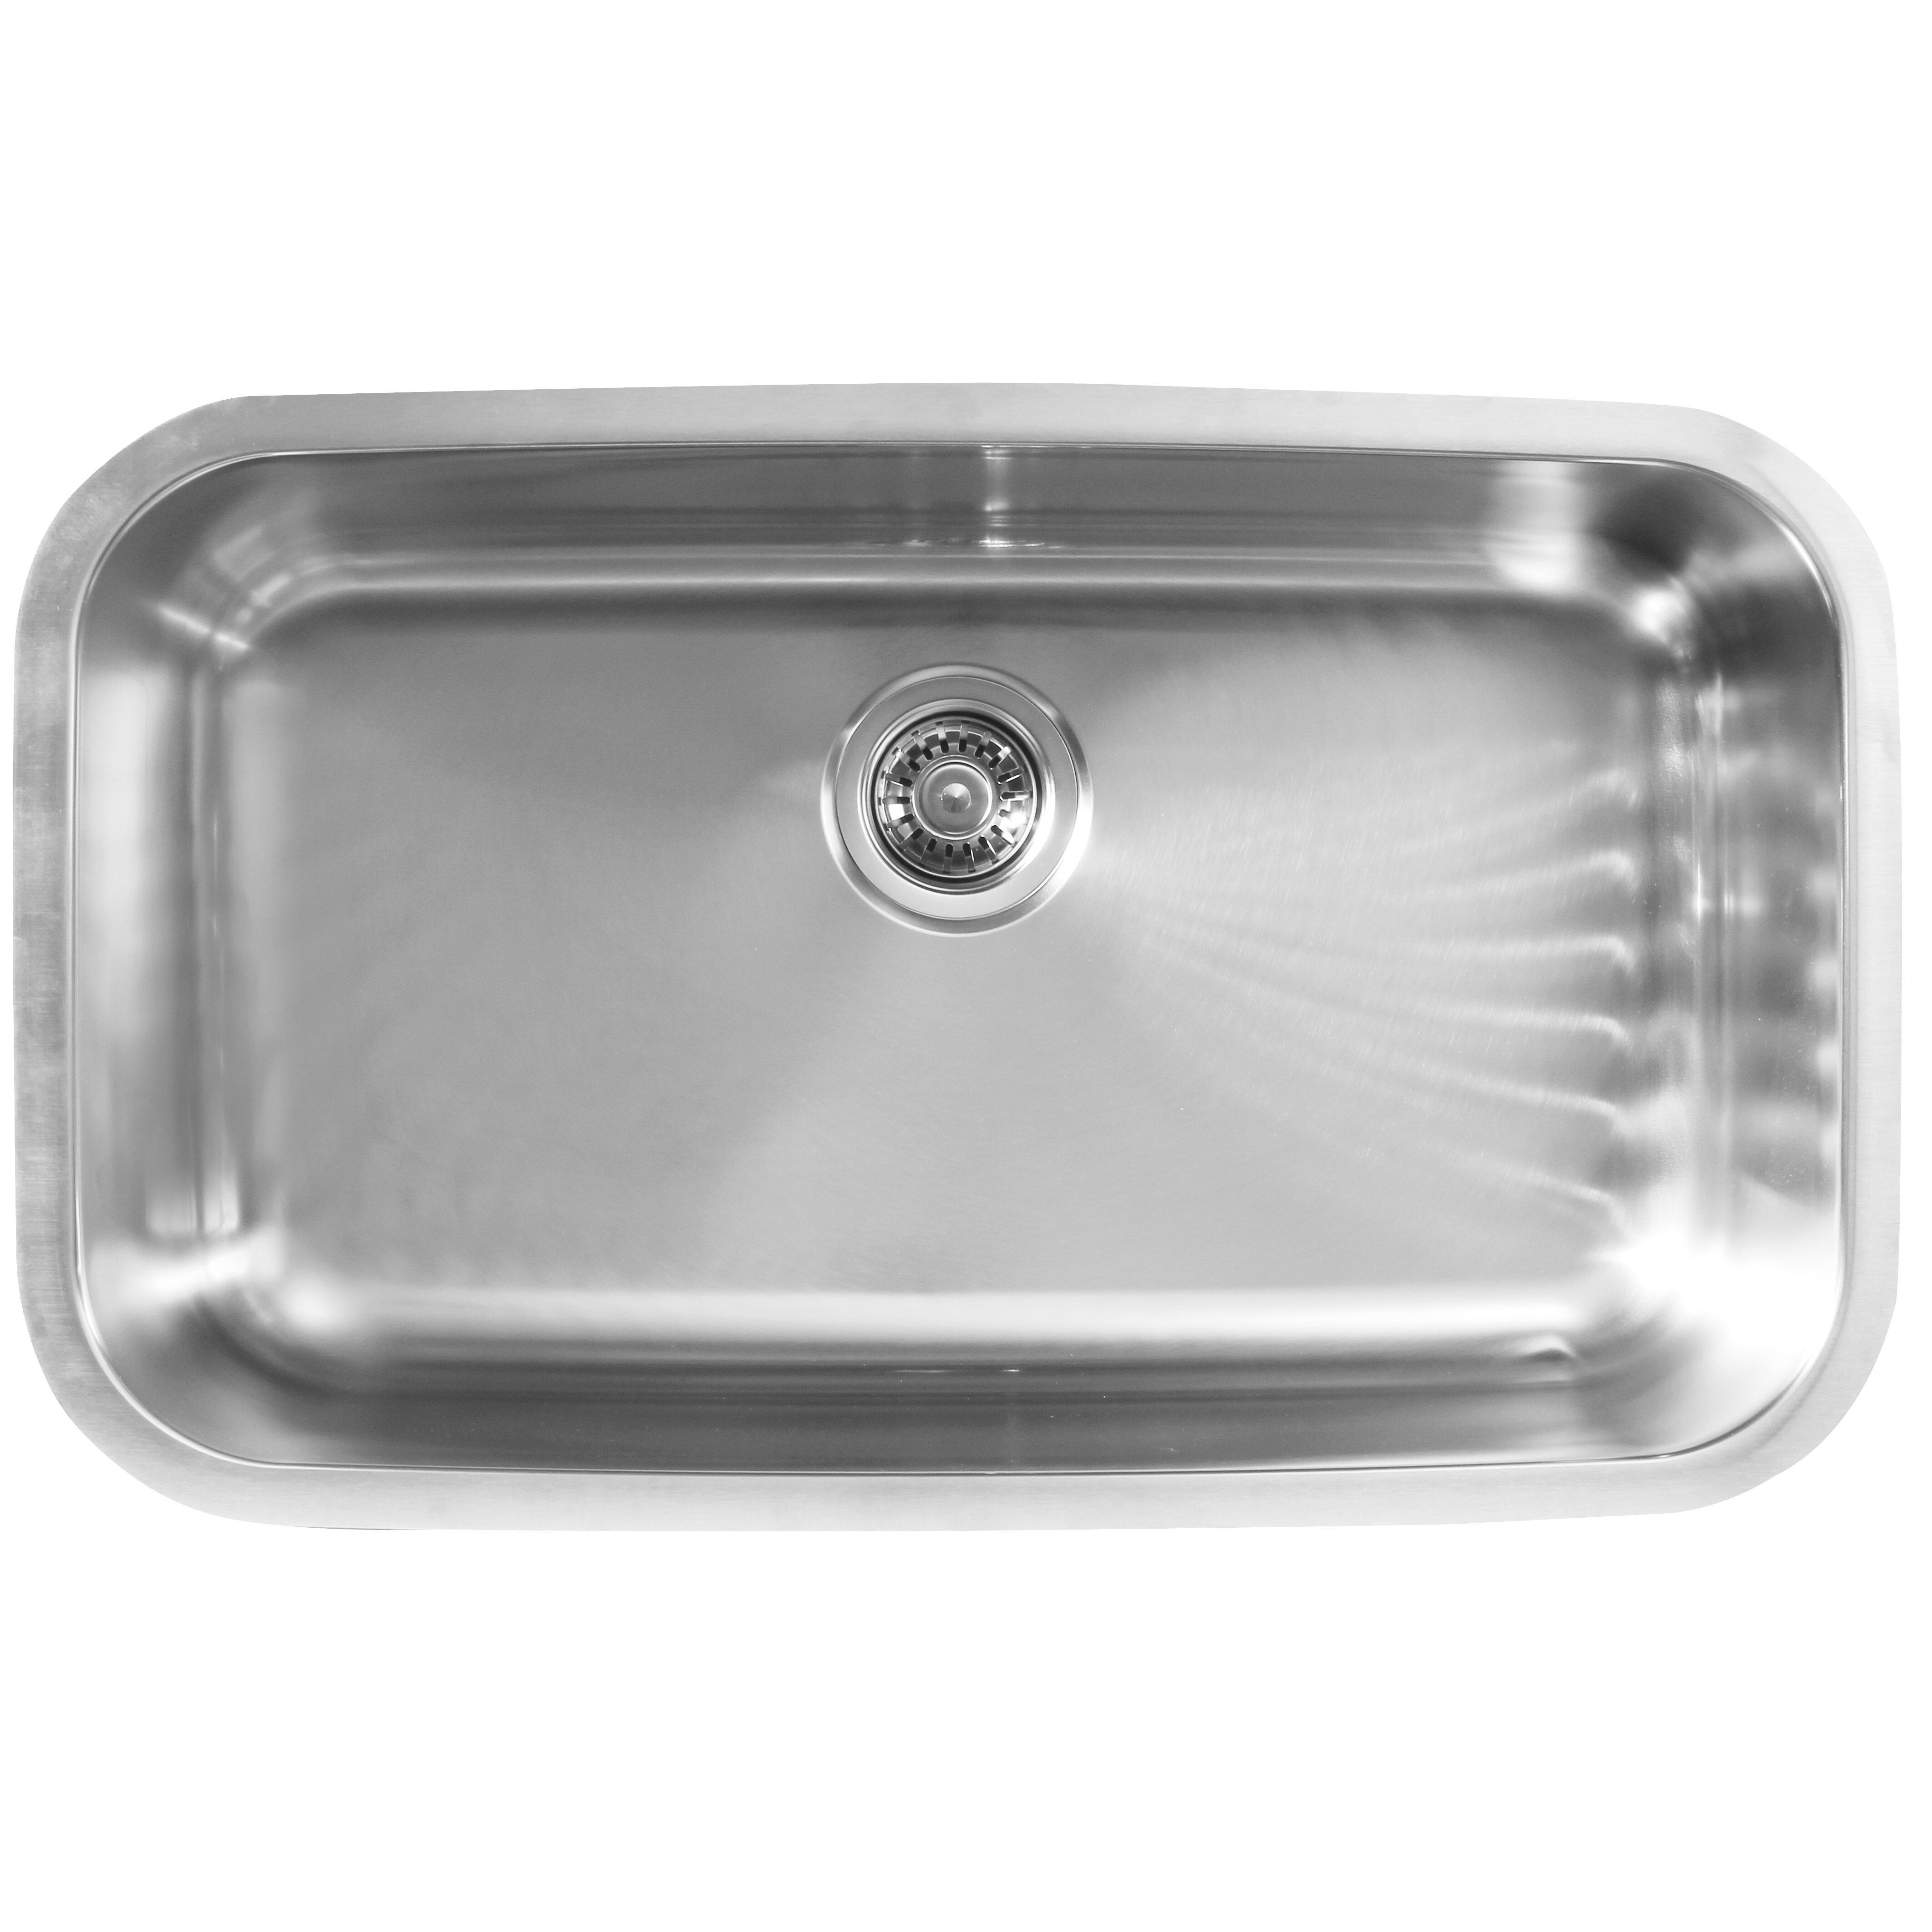 Black Undermount Kitchen Sinks Black Single Bowl Undermount Kitchen Sink Best Kitchen Ideas 2017